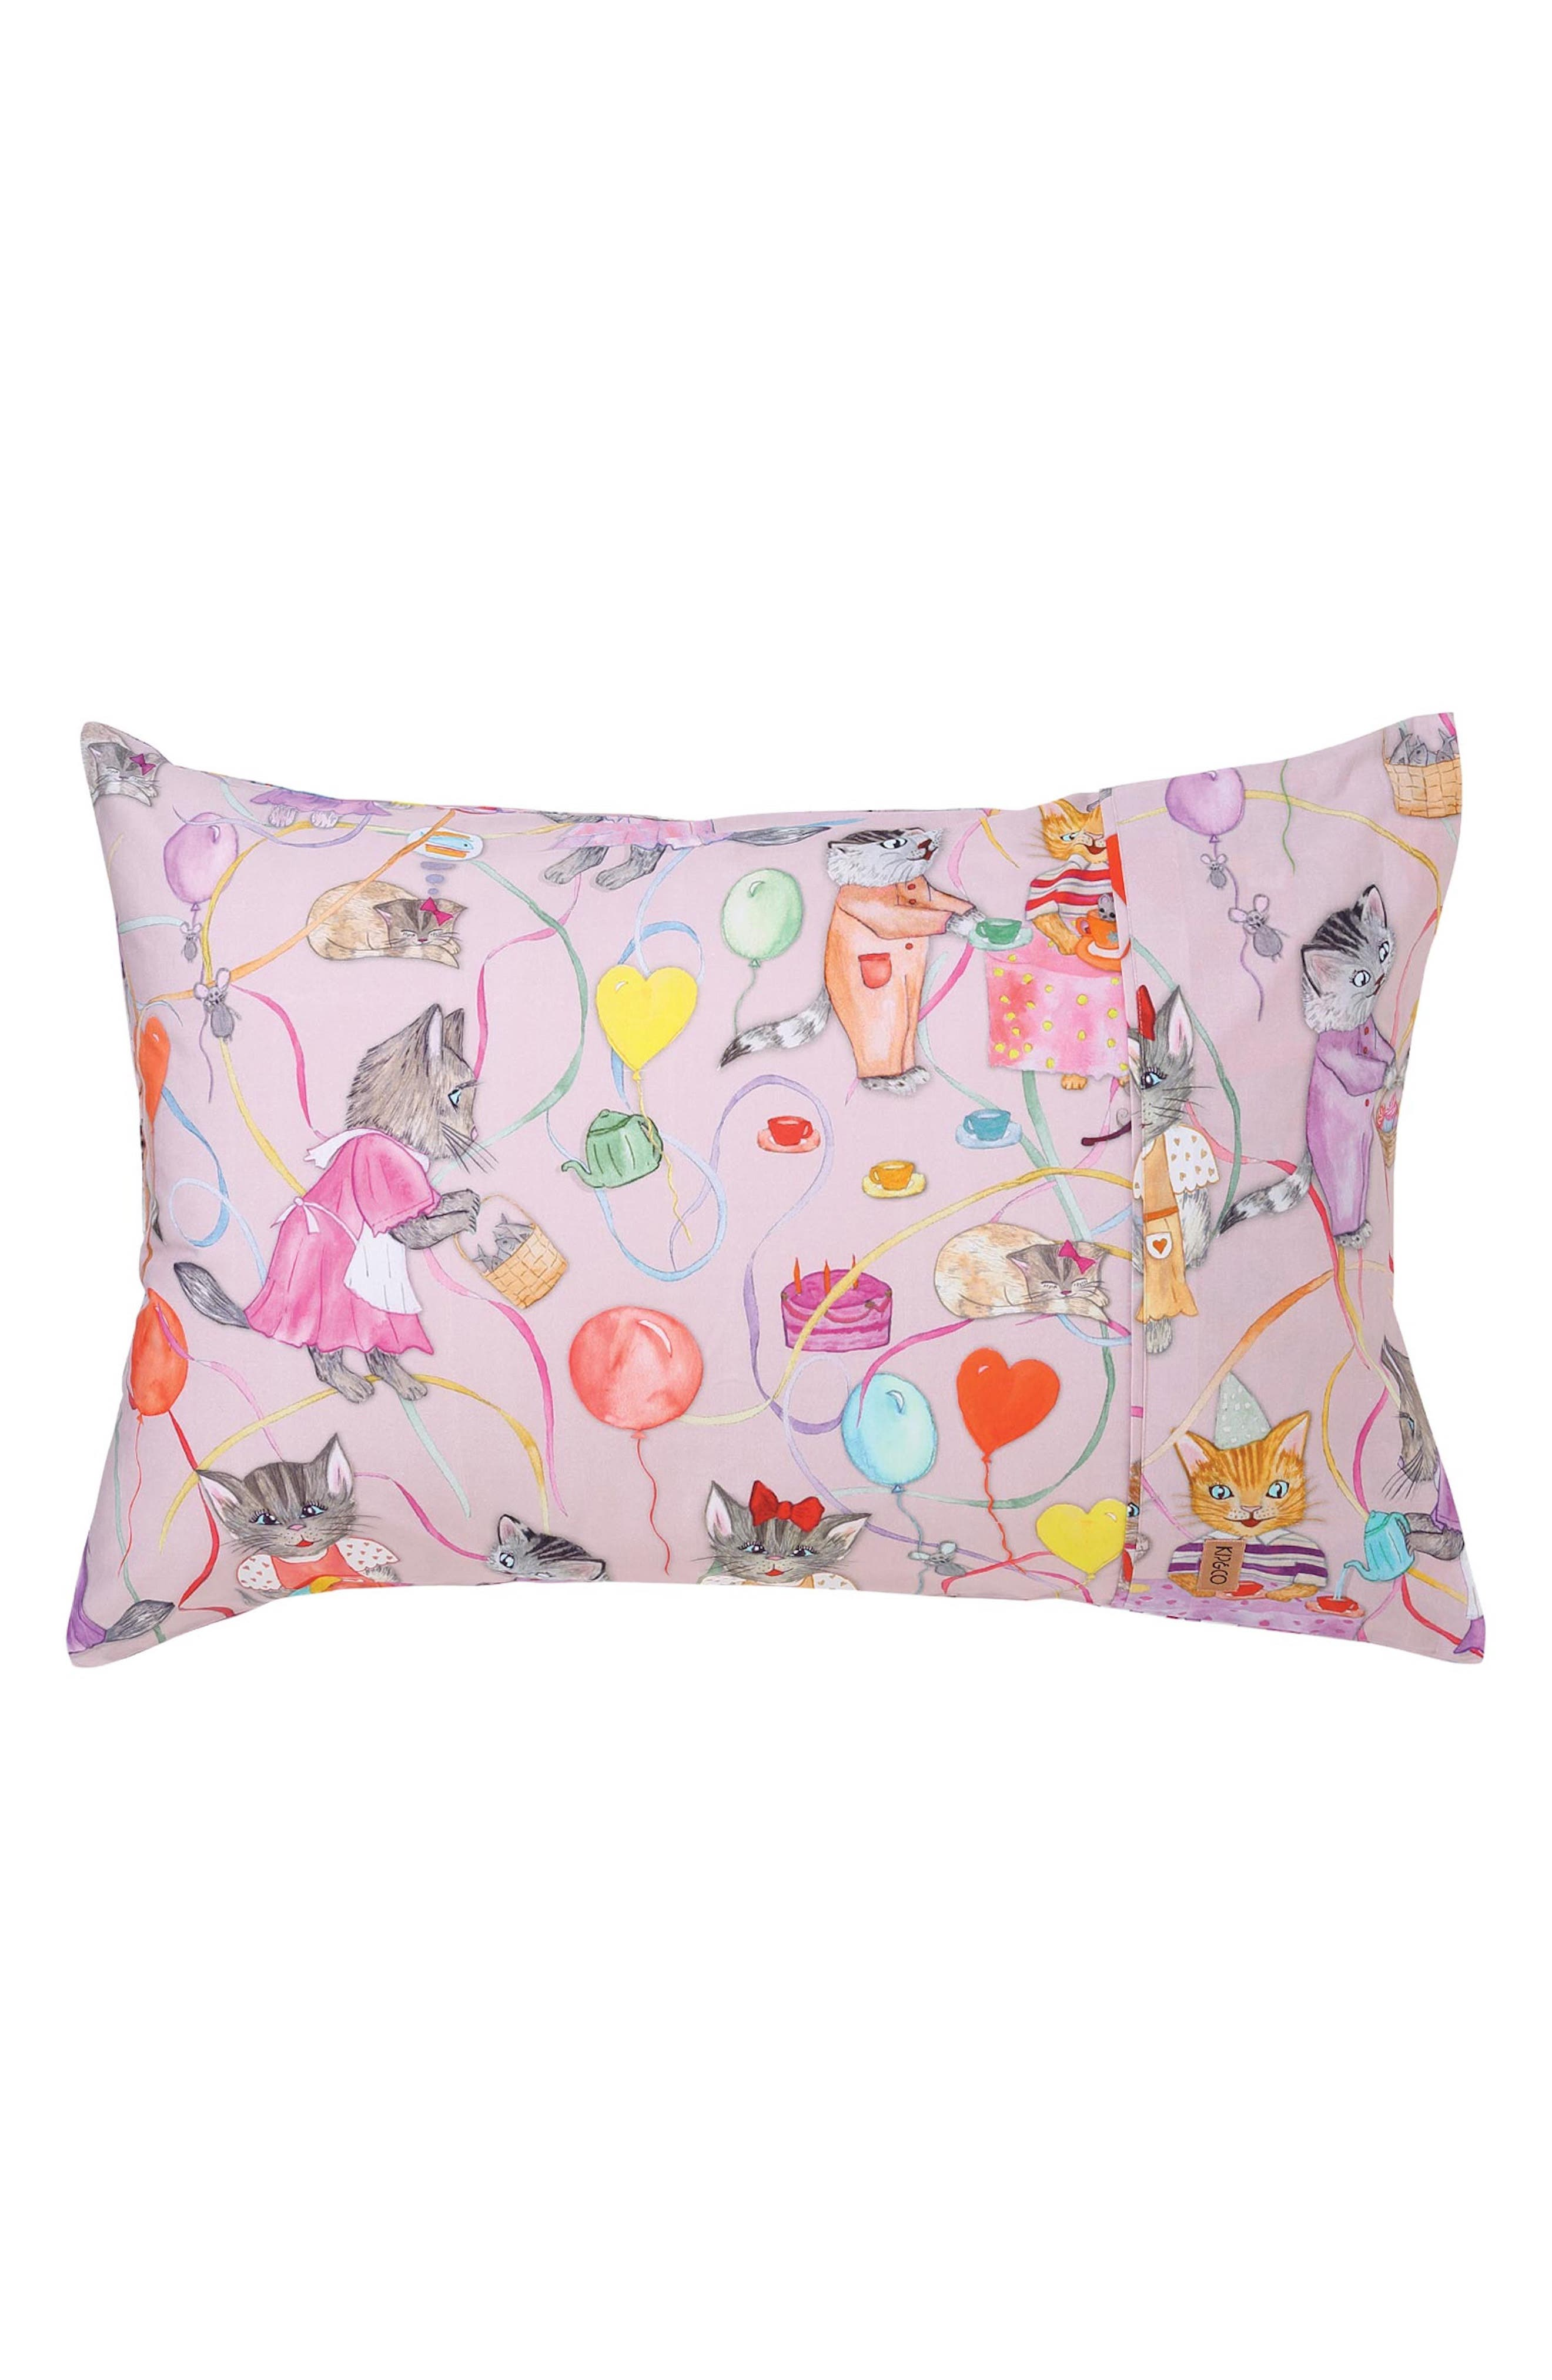 The Kitty Party Cotton Pillowcase,                             Main thumbnail 1, color,                             Multi